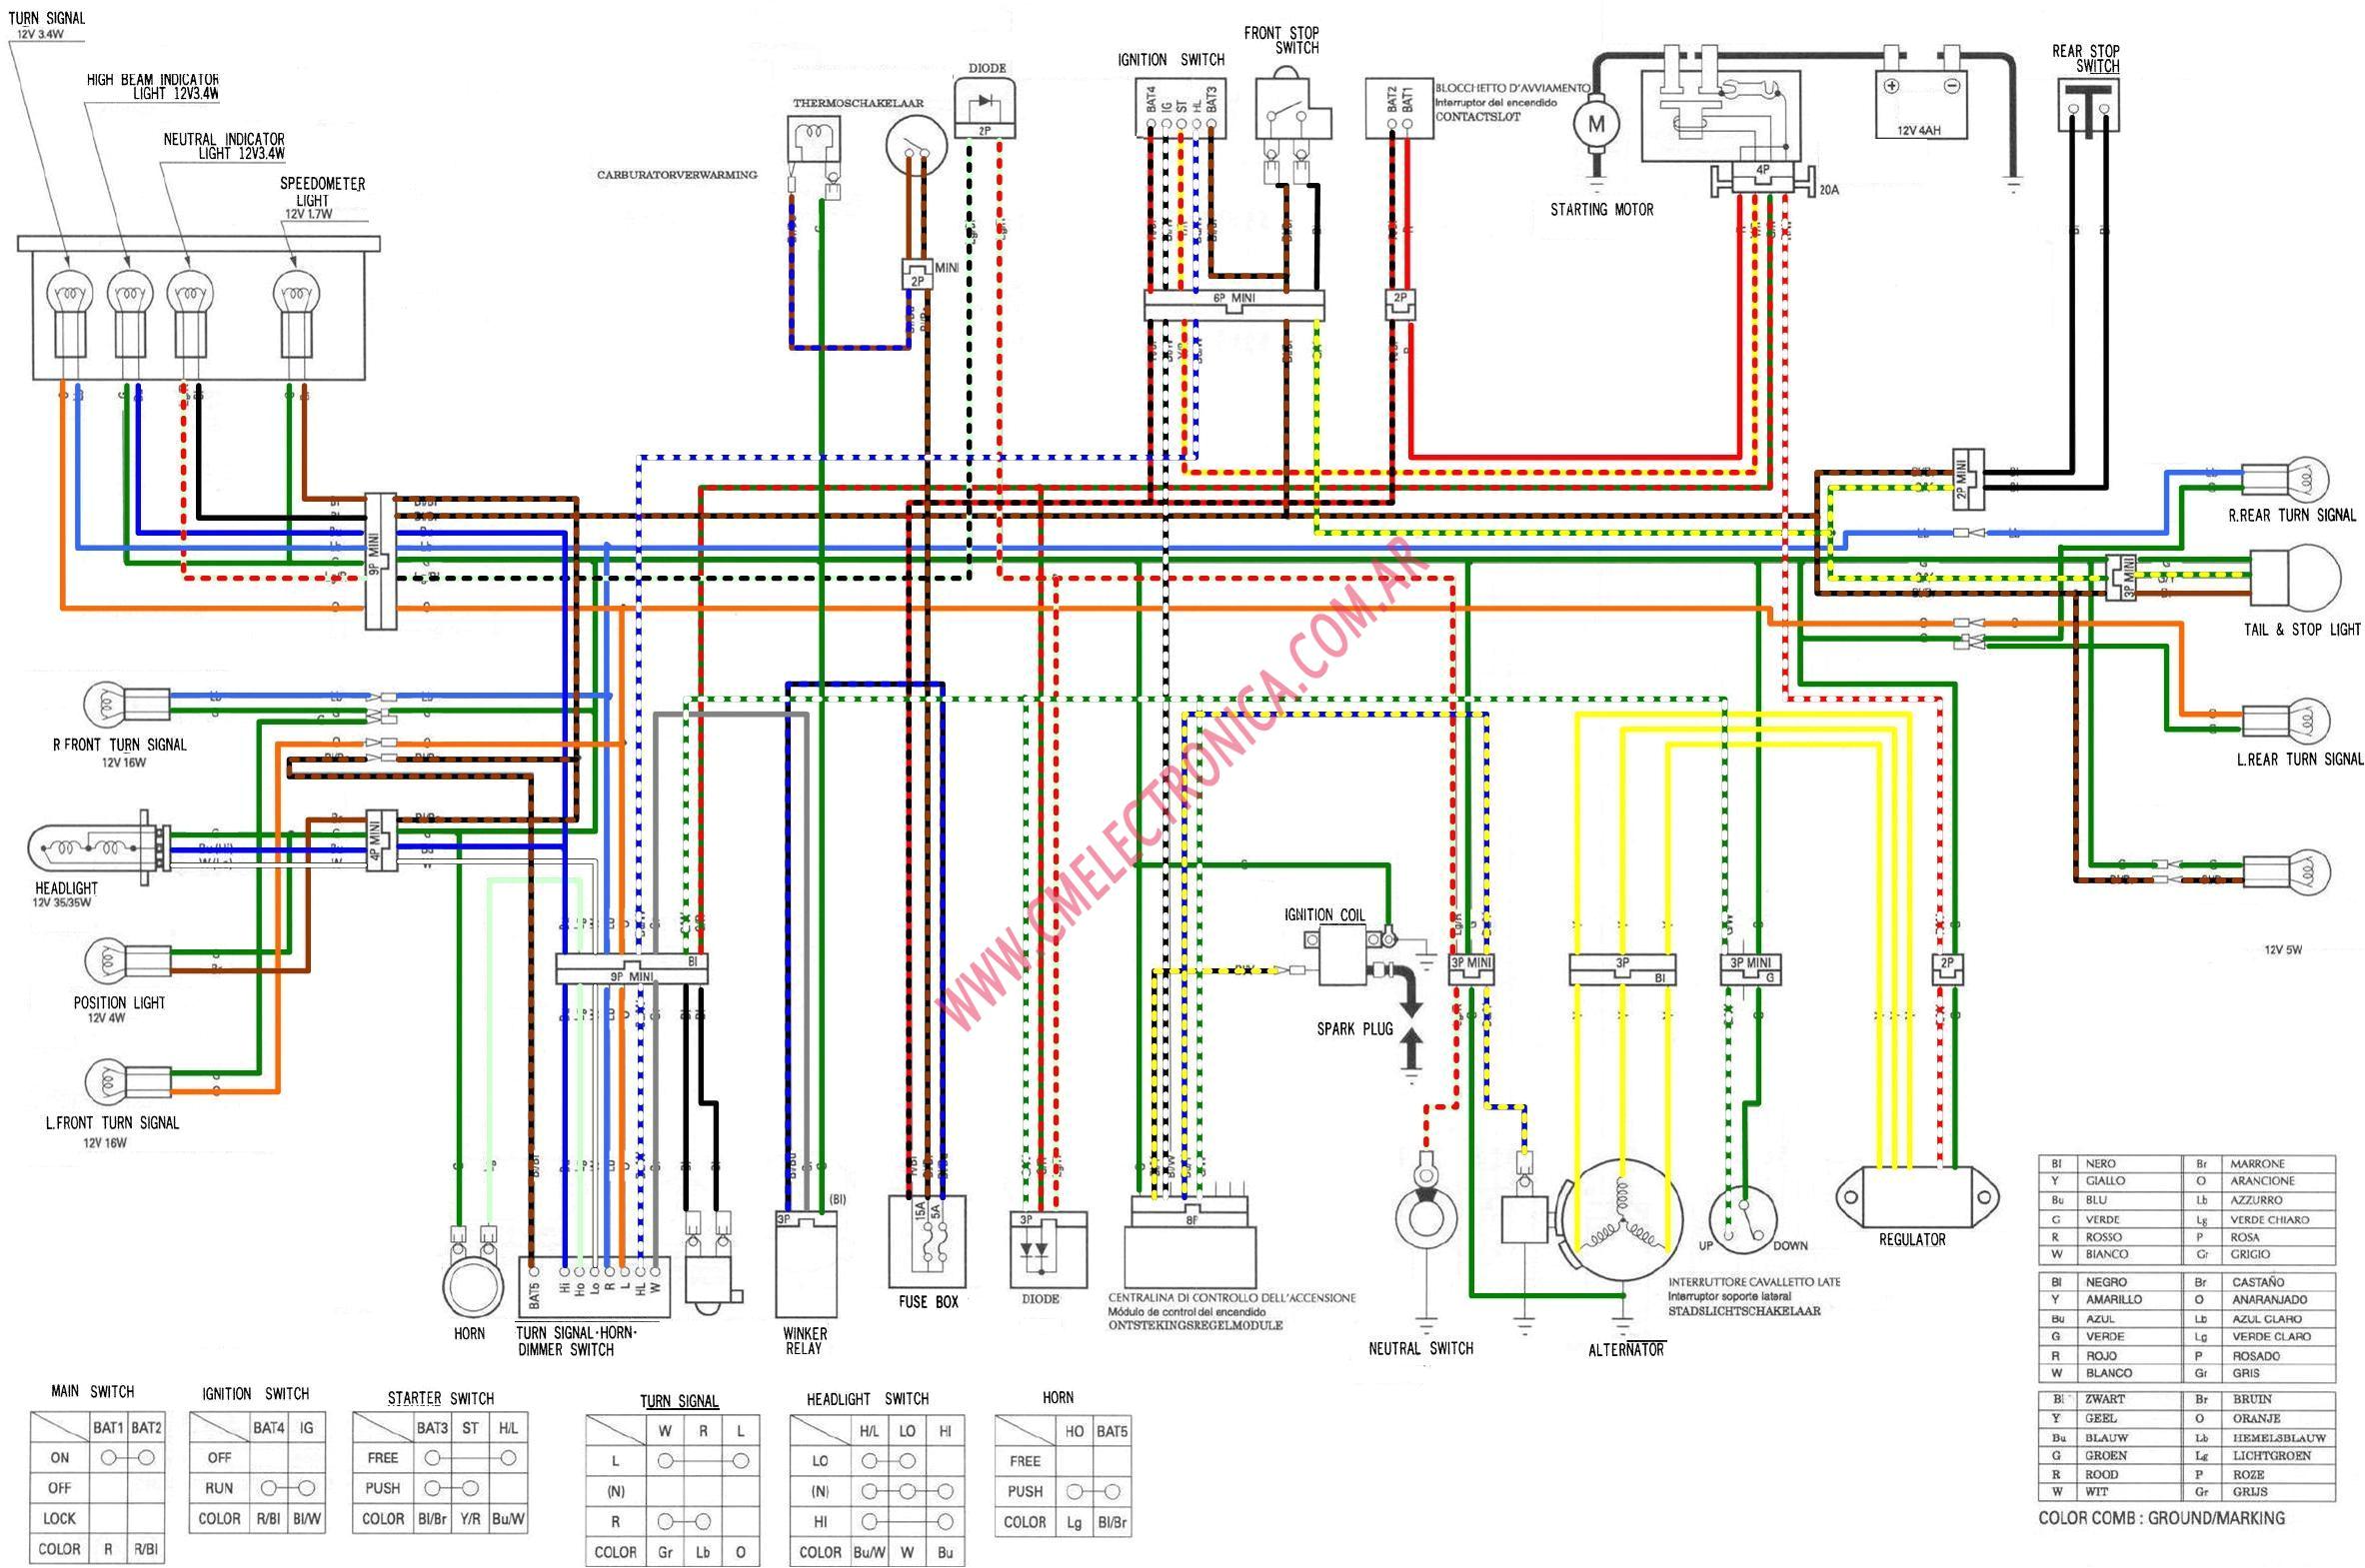 honda xl 125 wiring diagram wiring diagram expert 1977 honda xl 125 wiring diagram honda xl 125 wiring diagram